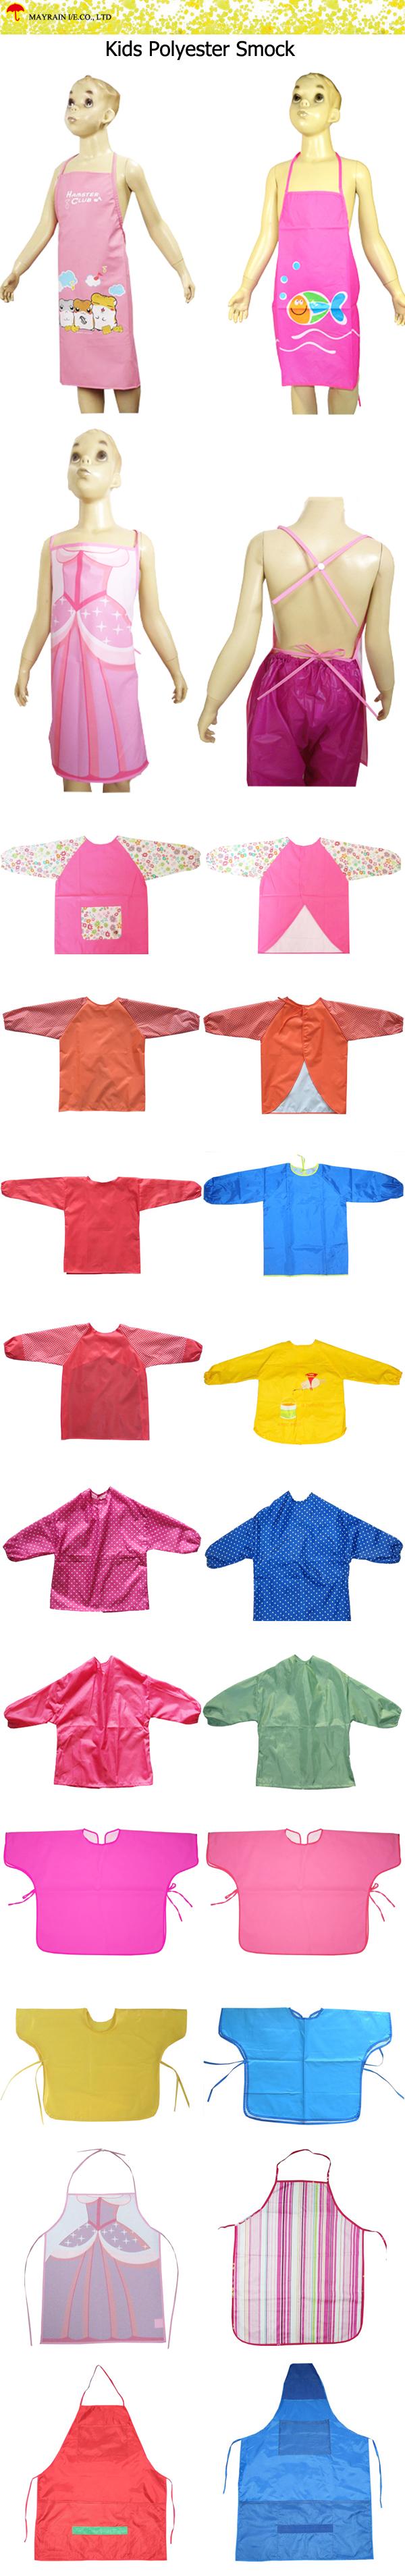 Kids Polyester Smock